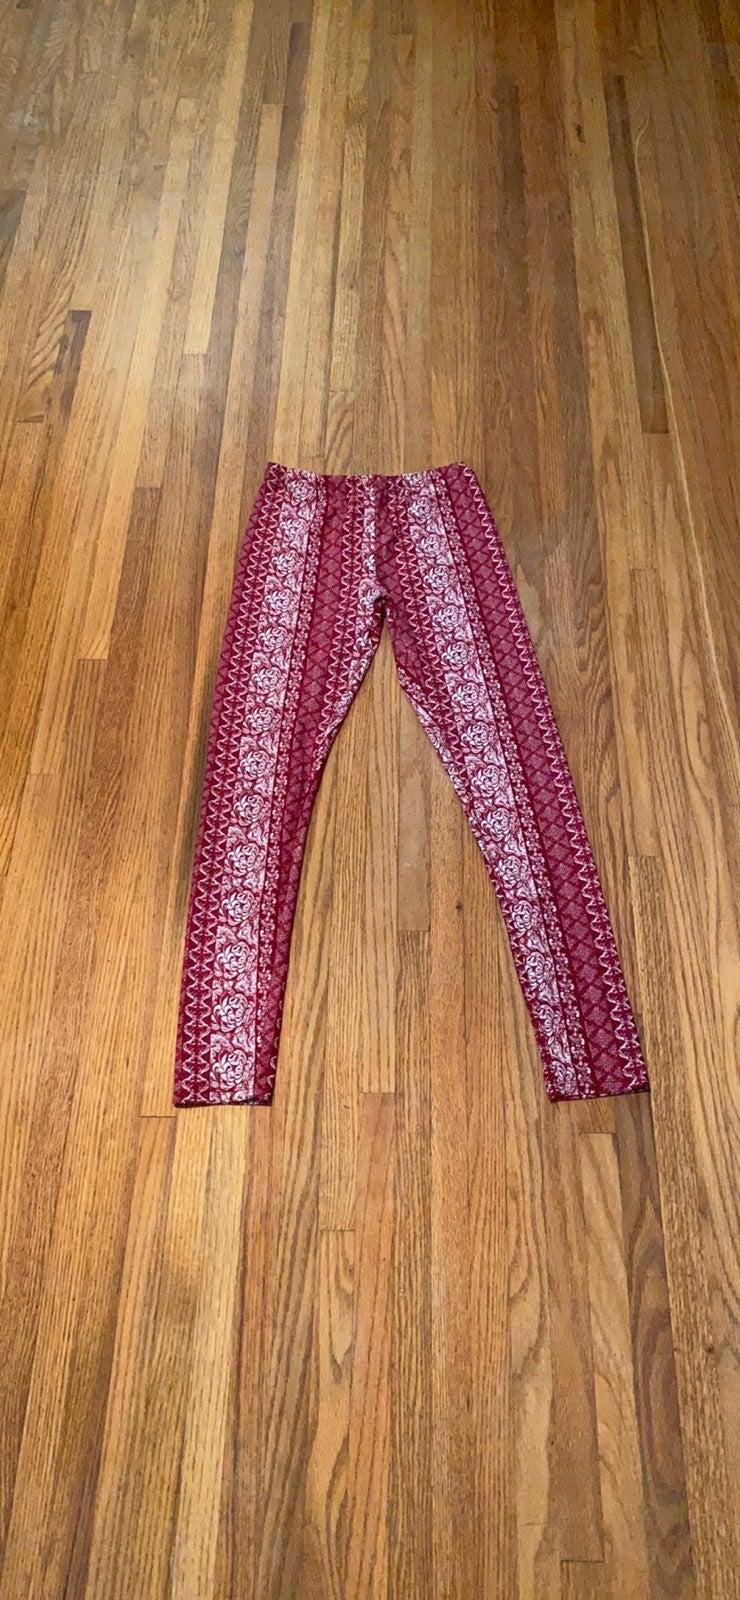 Gently Used Pink Rose Patterned Leggings